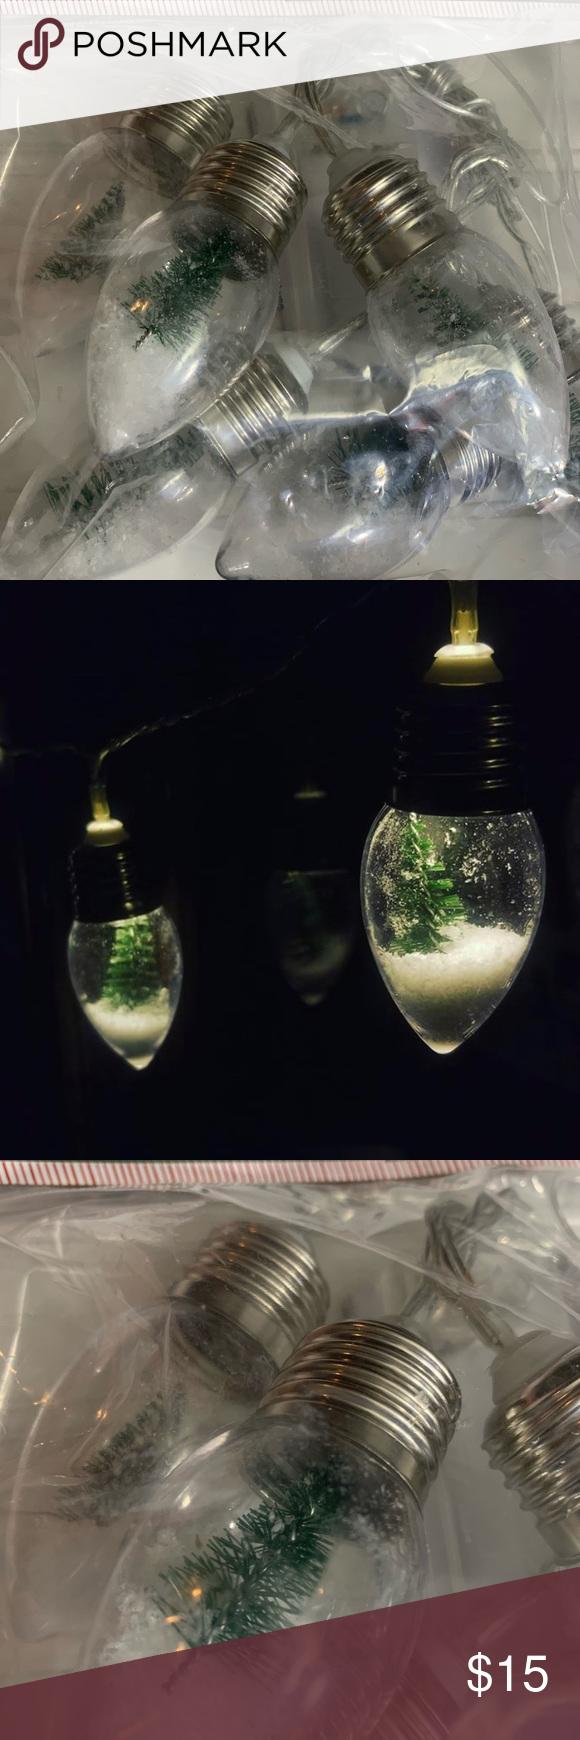 TARGET SNOW GLOBE CHRISTMAS TREE STRING OF LIGHTS The